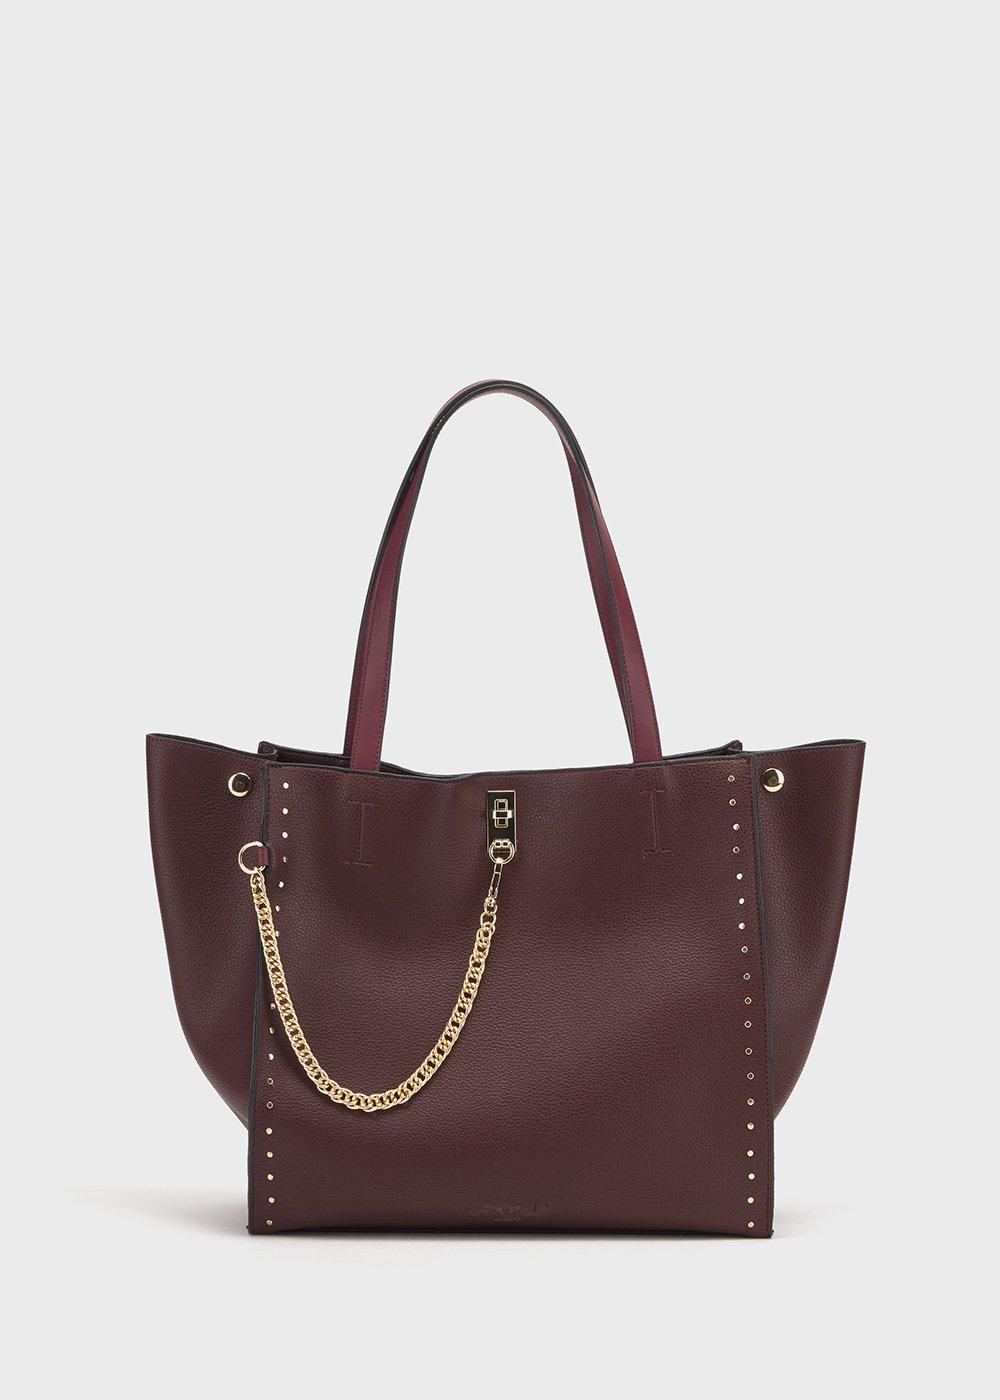 Brian shopping bag with deer print - Black cherry - Woman